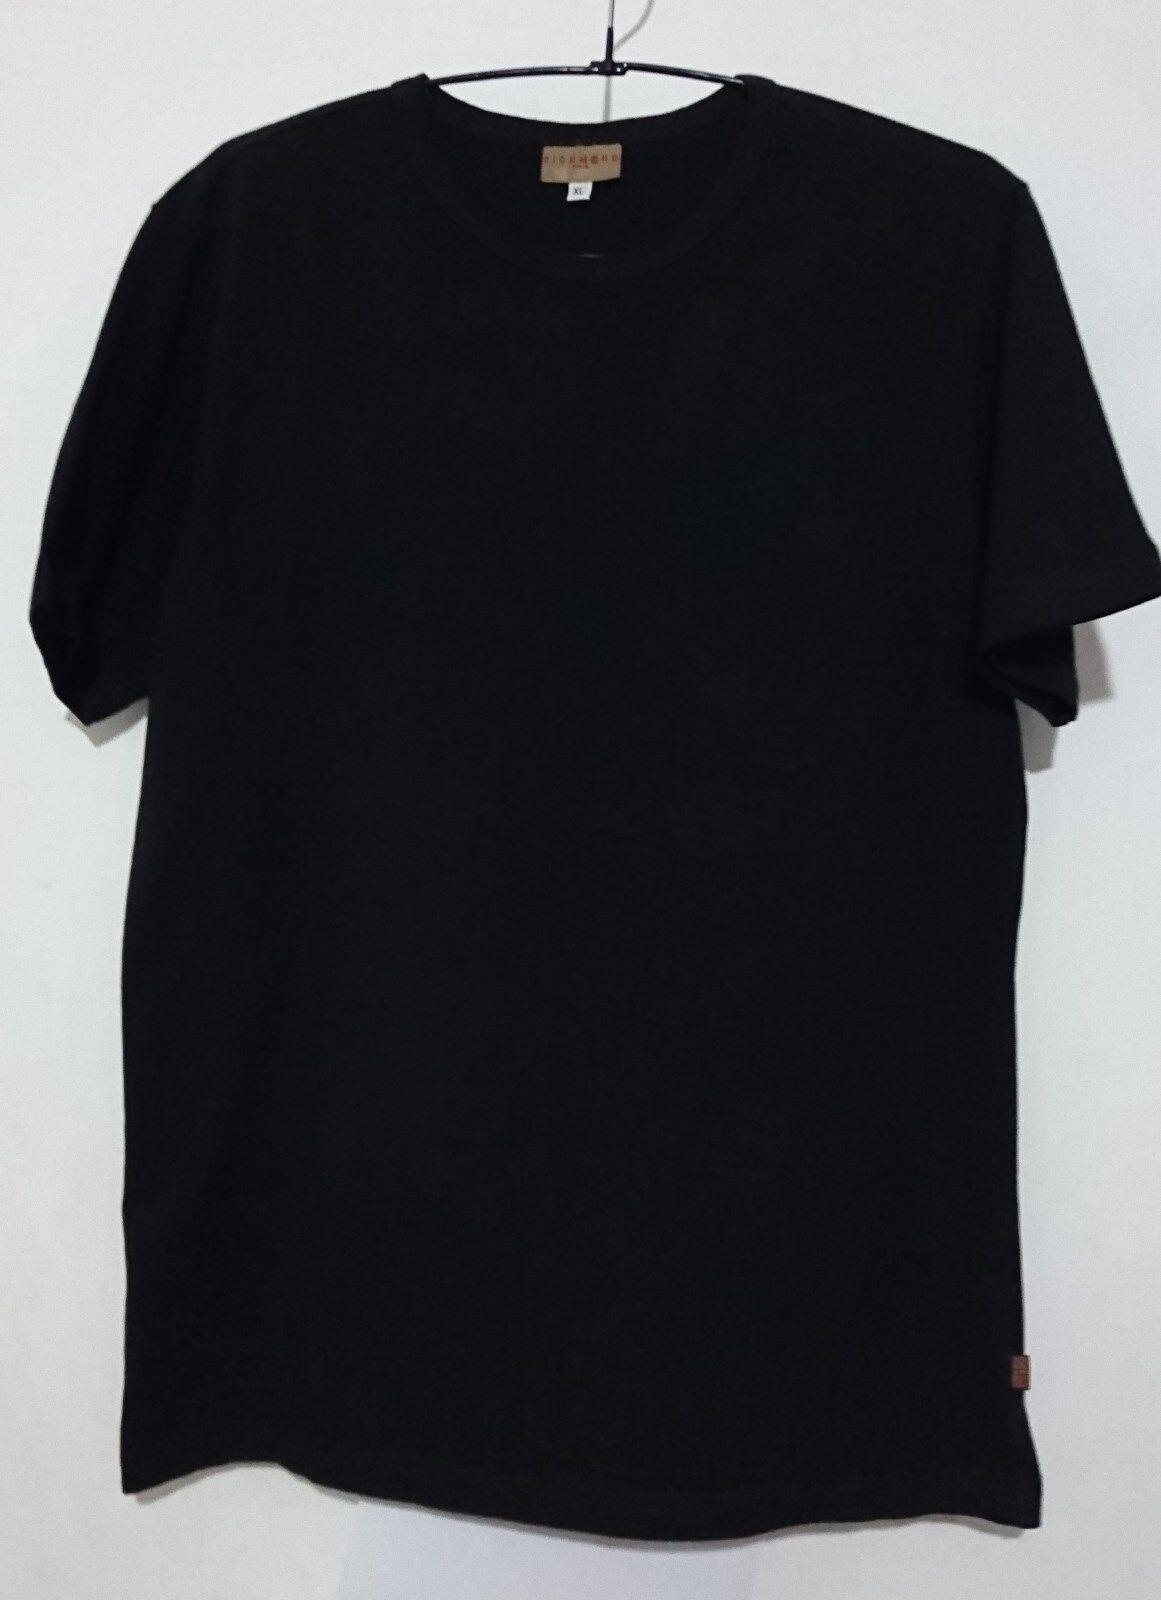 RICHMOND T-hemd schwarz COTONE PELLE VINTAGE CON RICAMO SCRITTA RICH TAGLIA XL